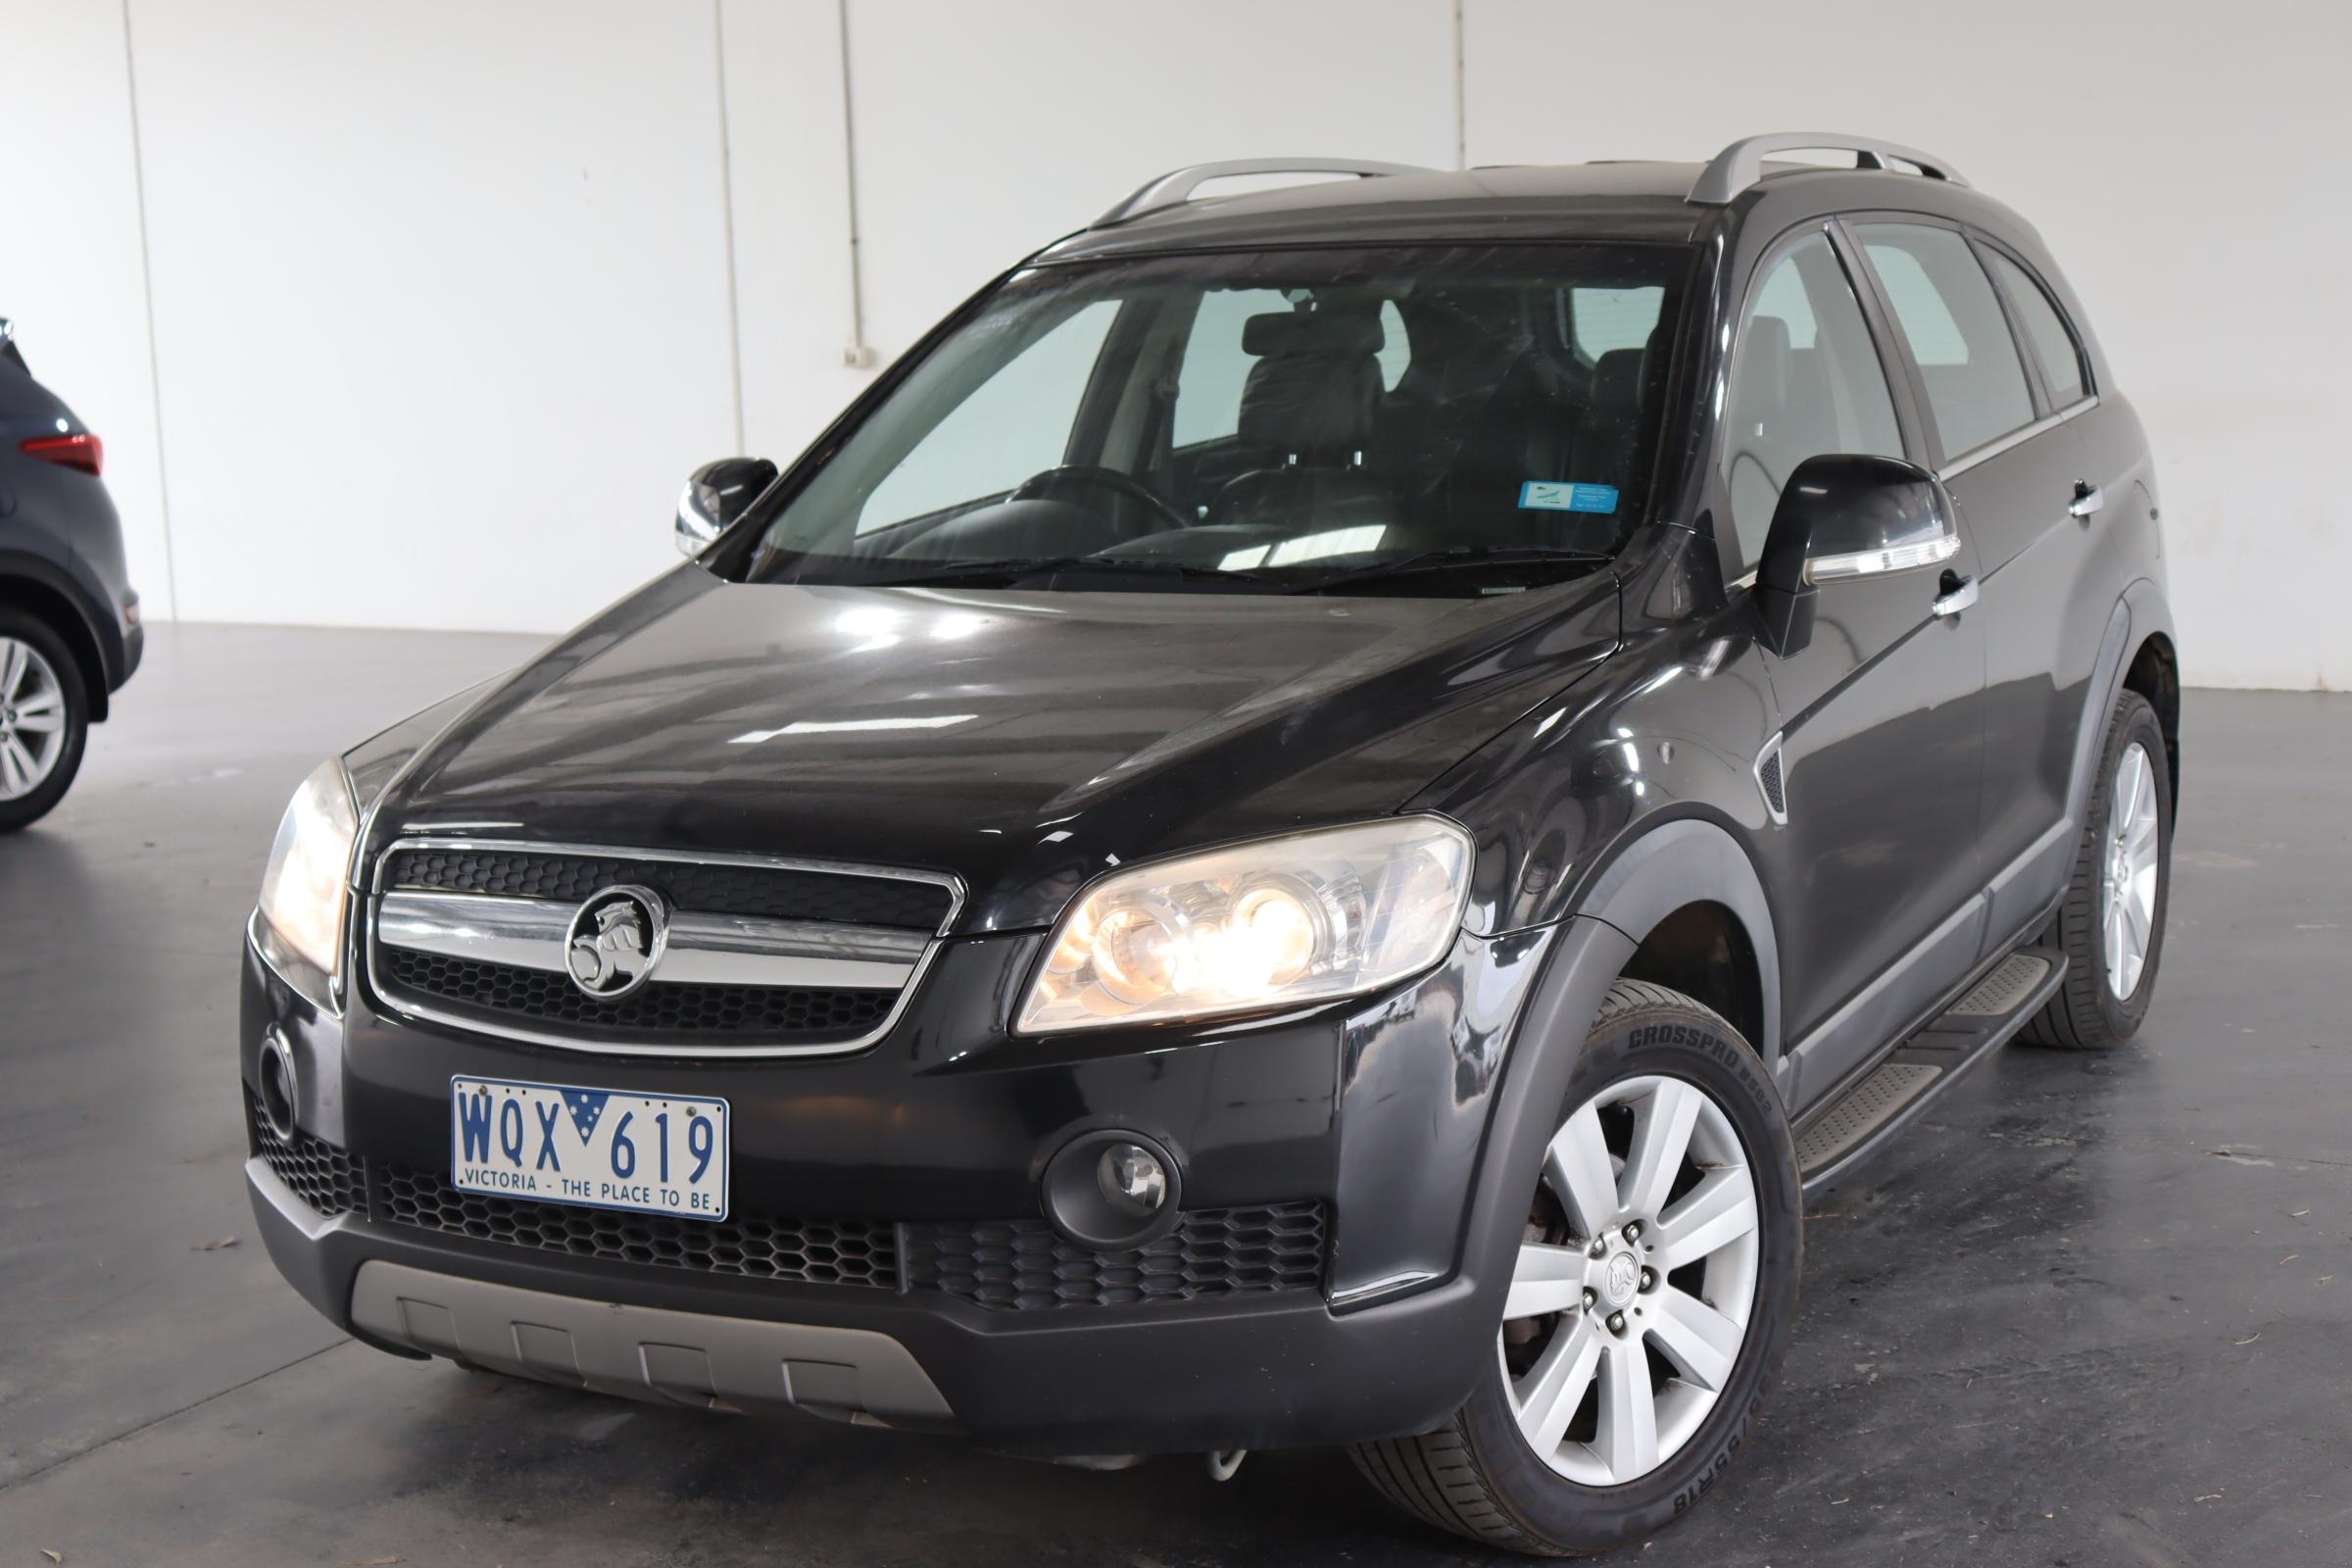 2008 Holden Captiva LX (4x4) CG Turbo Diesel Automatic 7 Seats Wagon